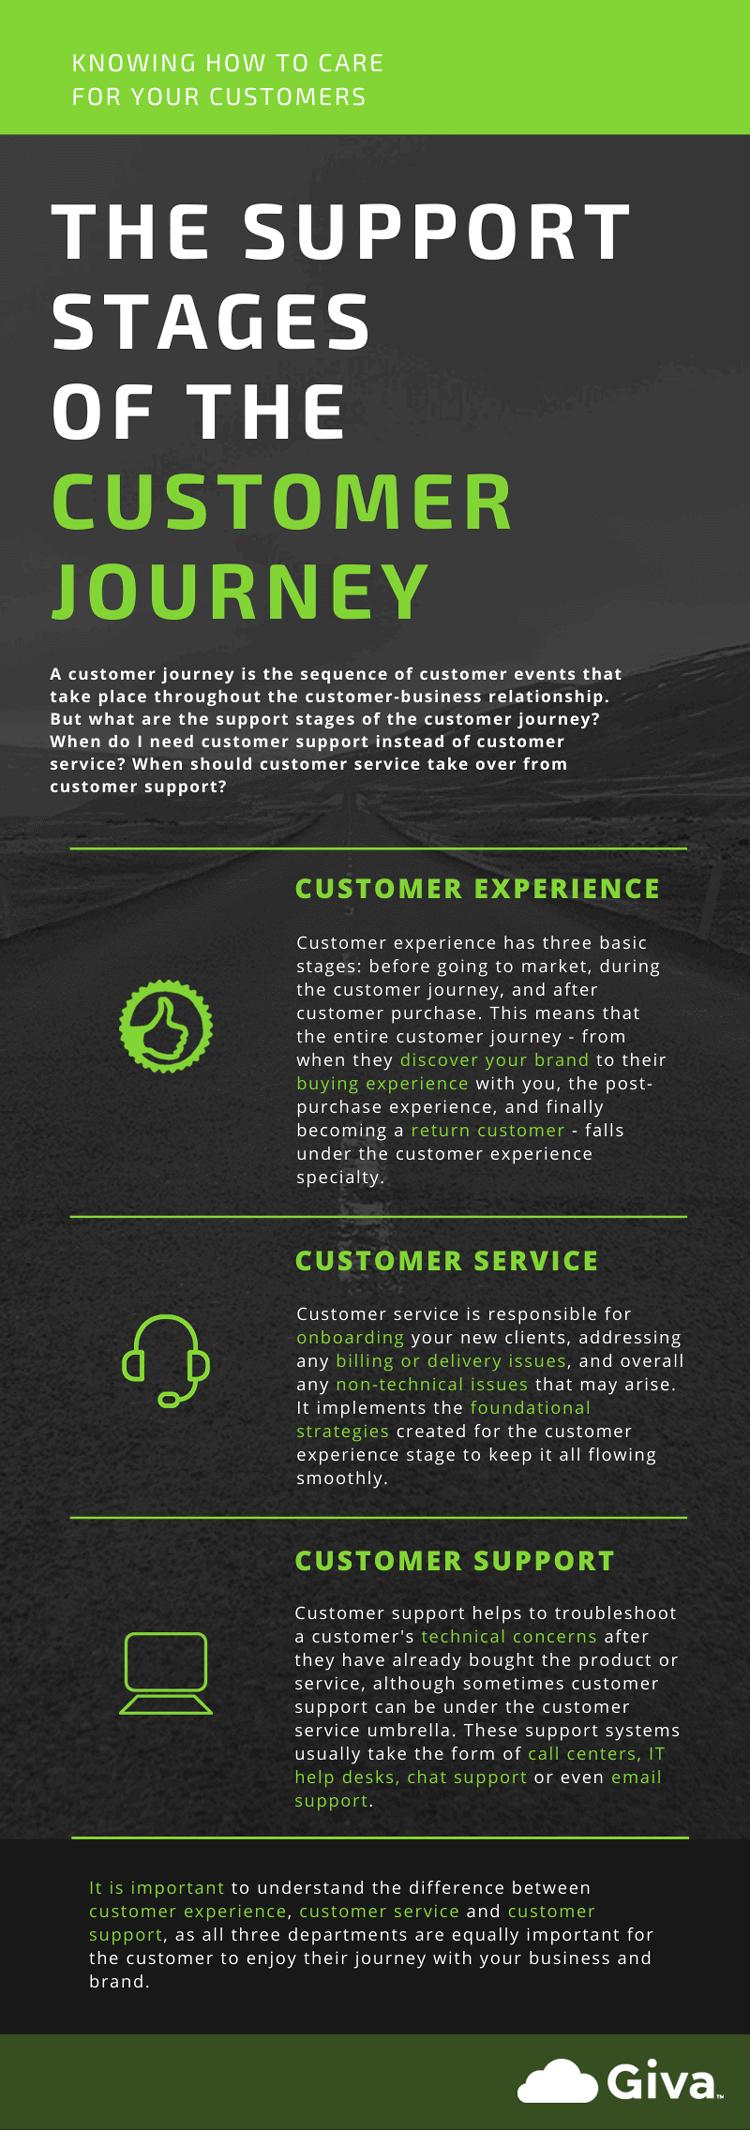 Customer Experience vs Customer Service vs Customer Support